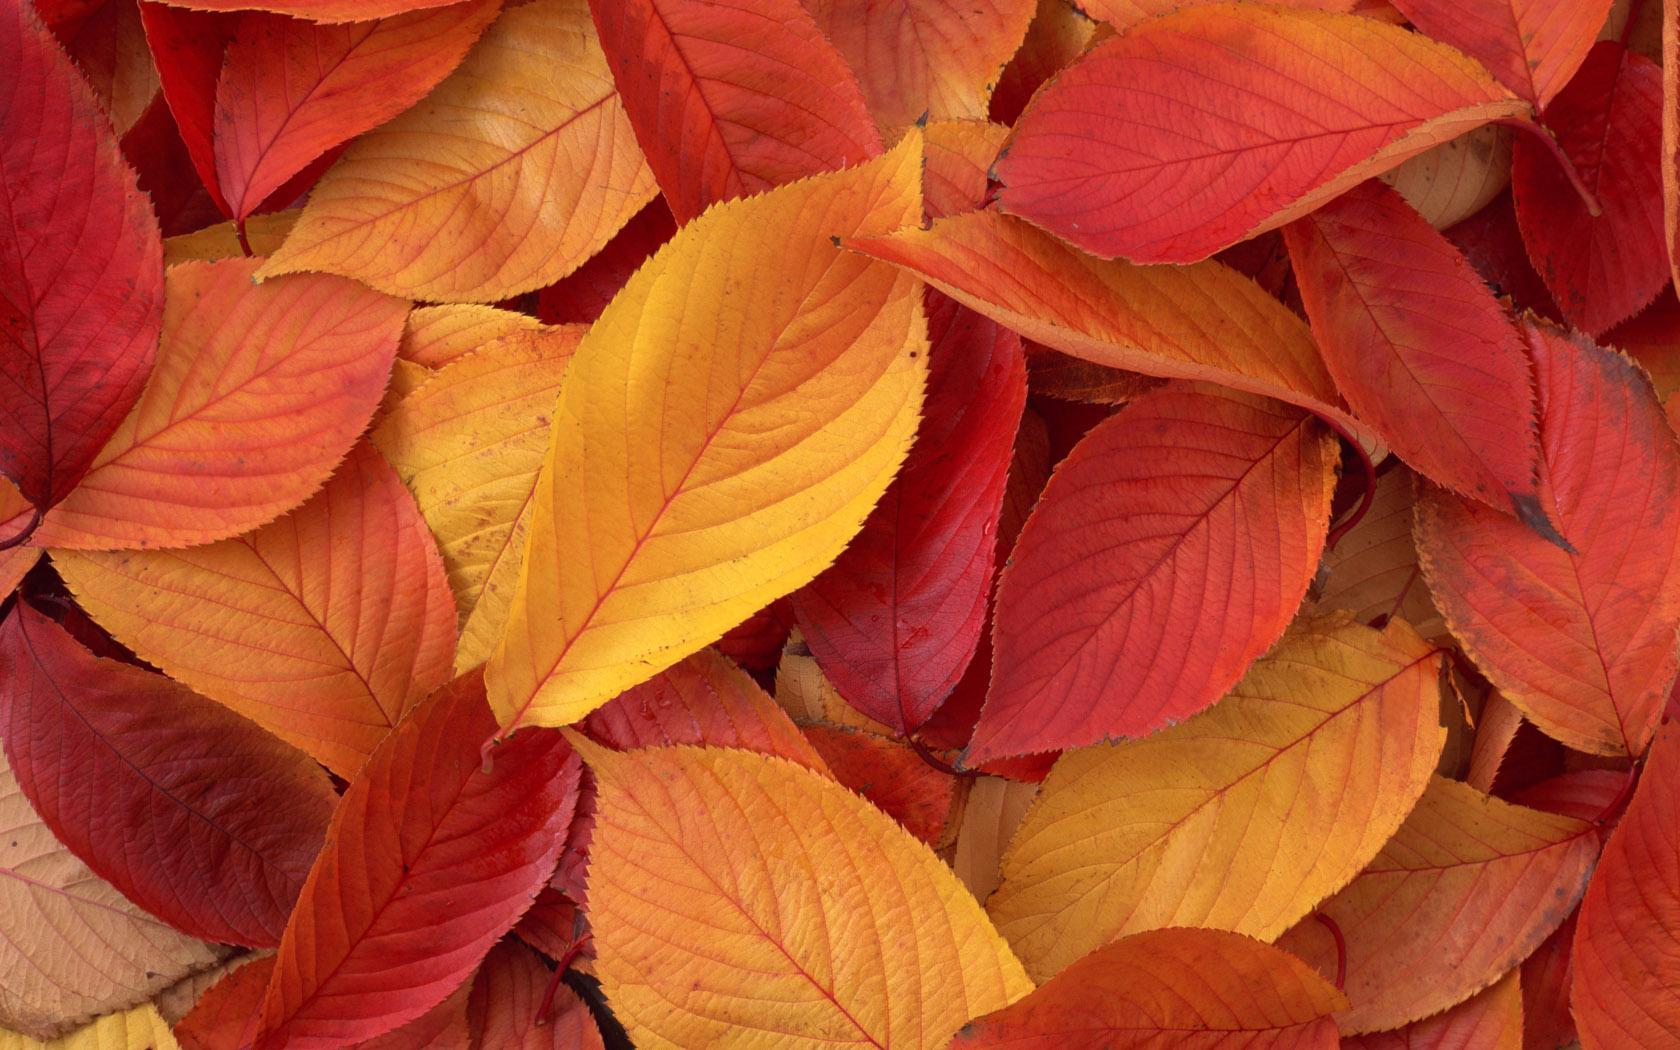 4k Fall Painting Wallpapers Fall Scenes Images Hd Hd Desktop Wallpapers 4k Hd